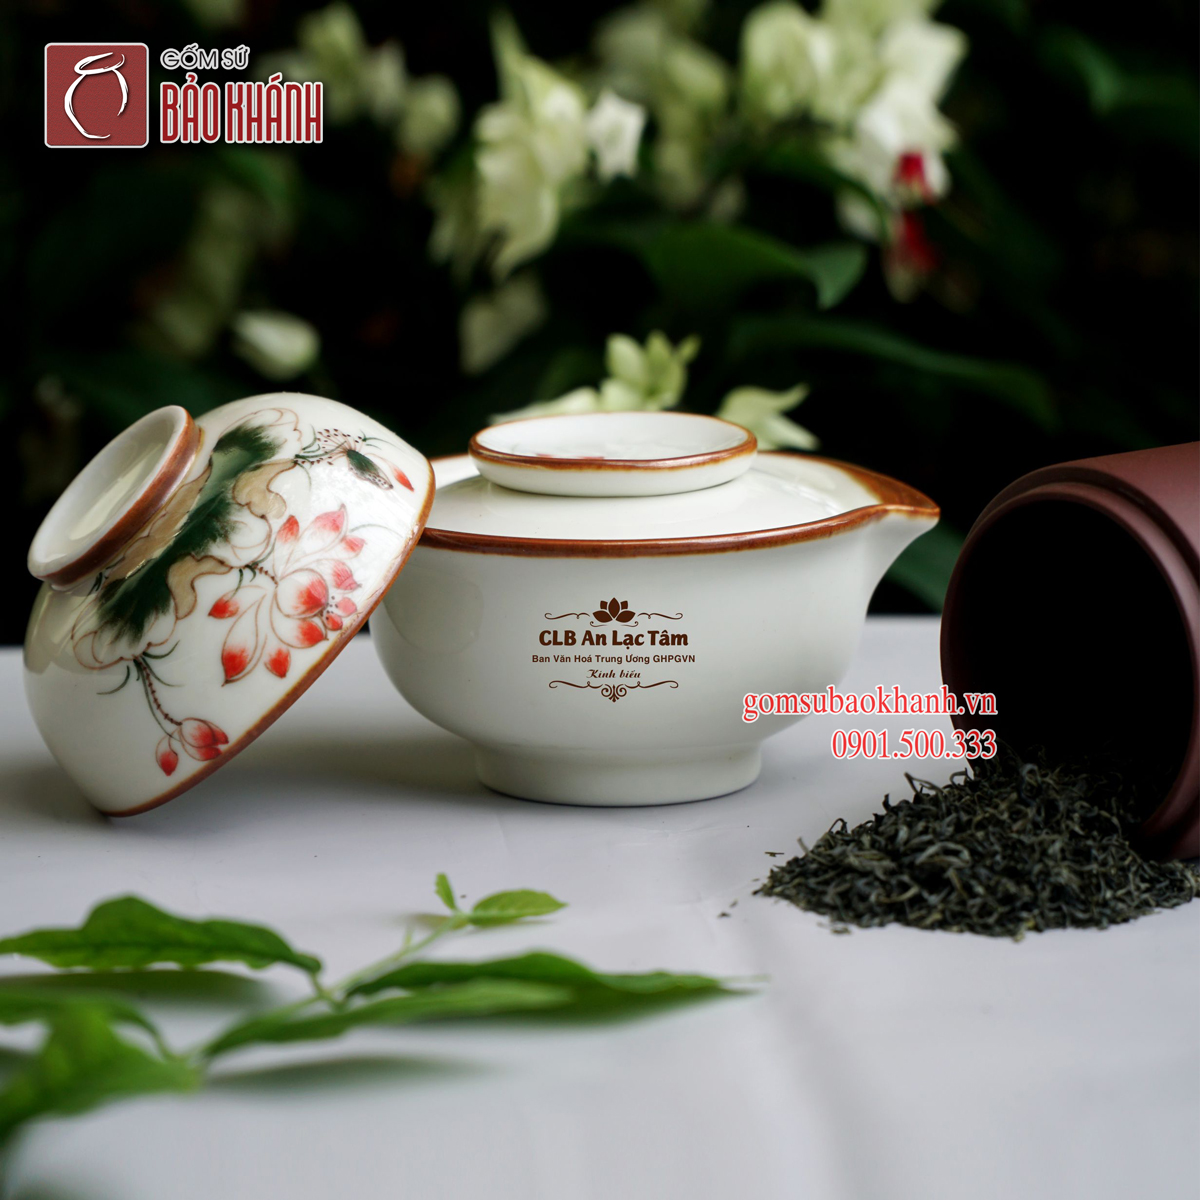 Bộ trà độc ẩm men kem vẽ hoa sen in logo